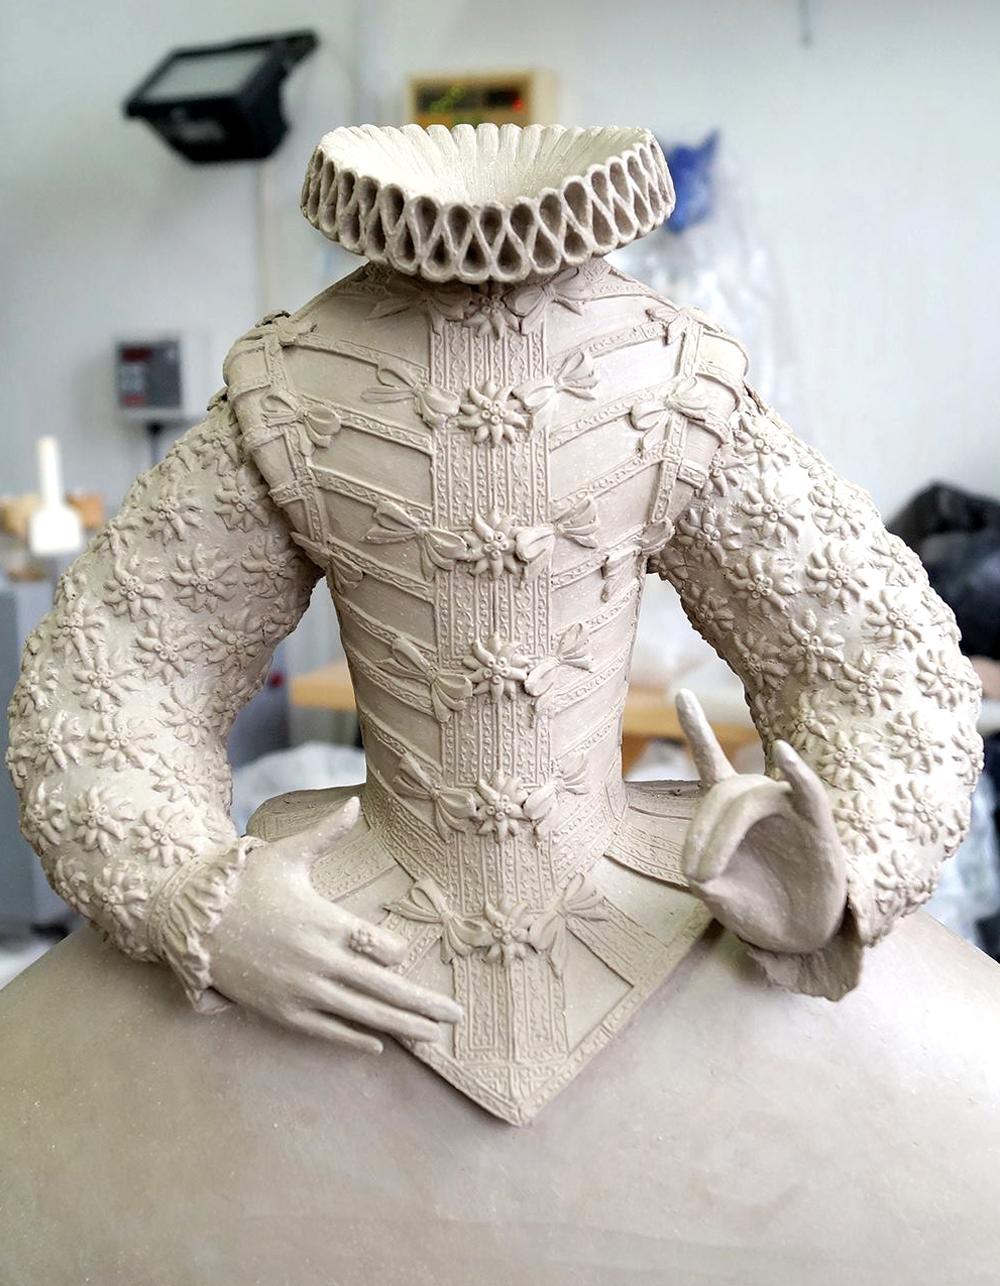 Crea.Tips - Sanat - Seramik Sanati - The New Age Of Ceramics - Kitap - HannahStouffer - Claire Shaw